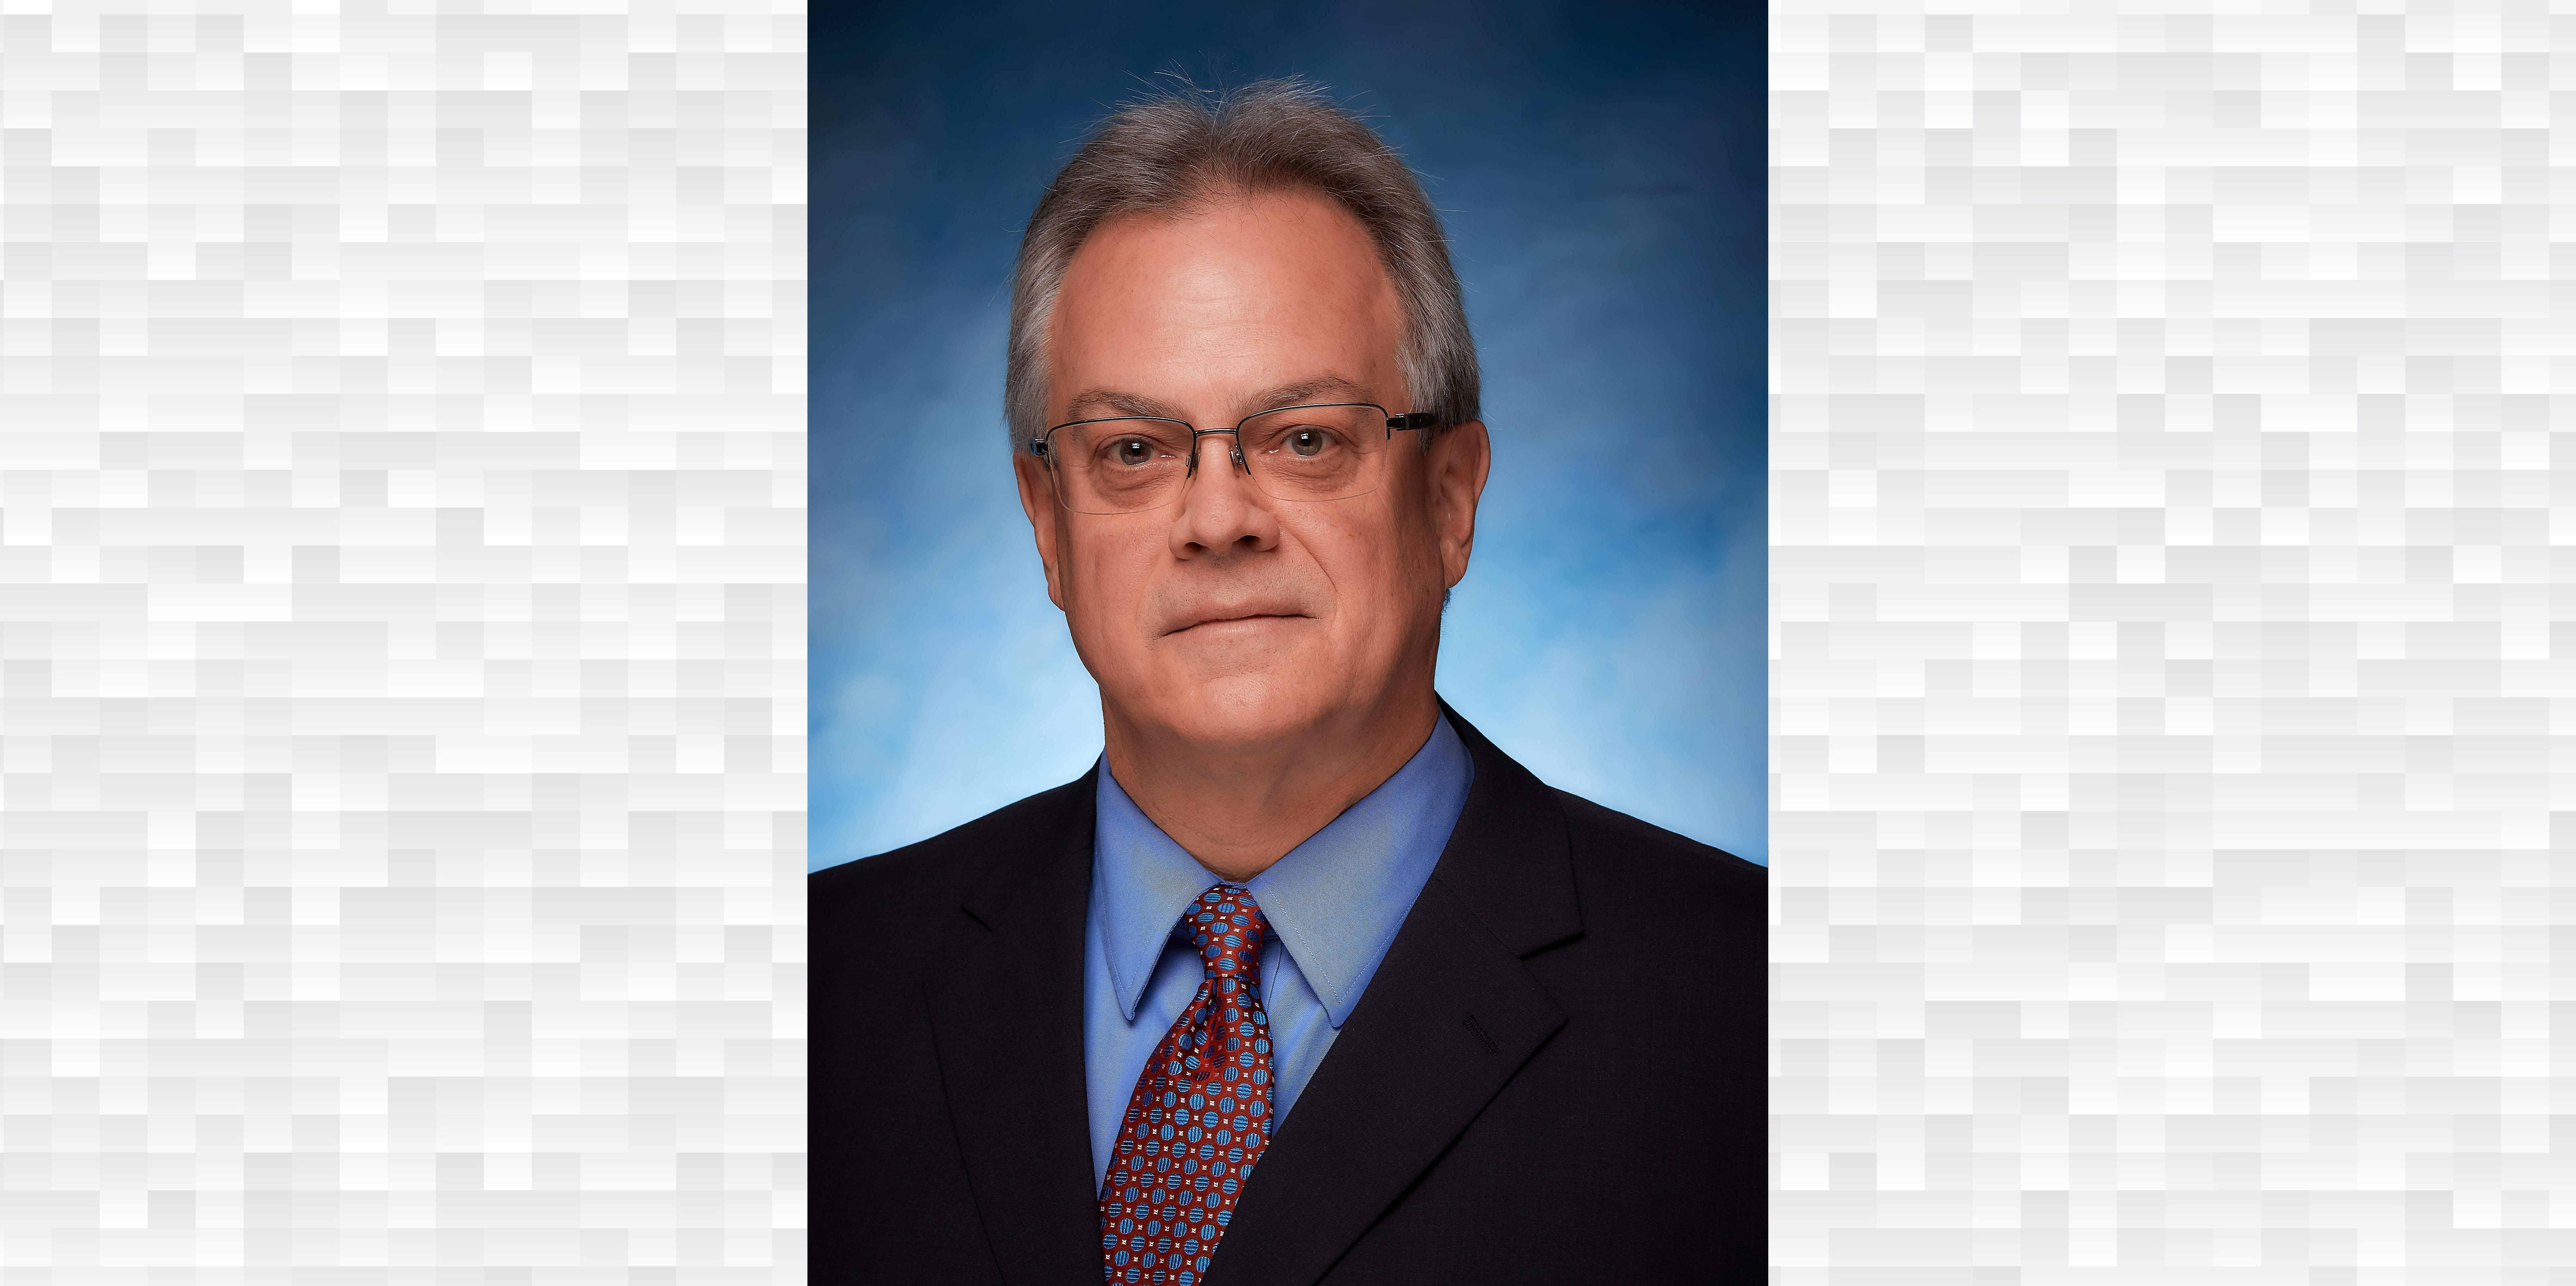 FedEx Names Mark Allen as Next GC